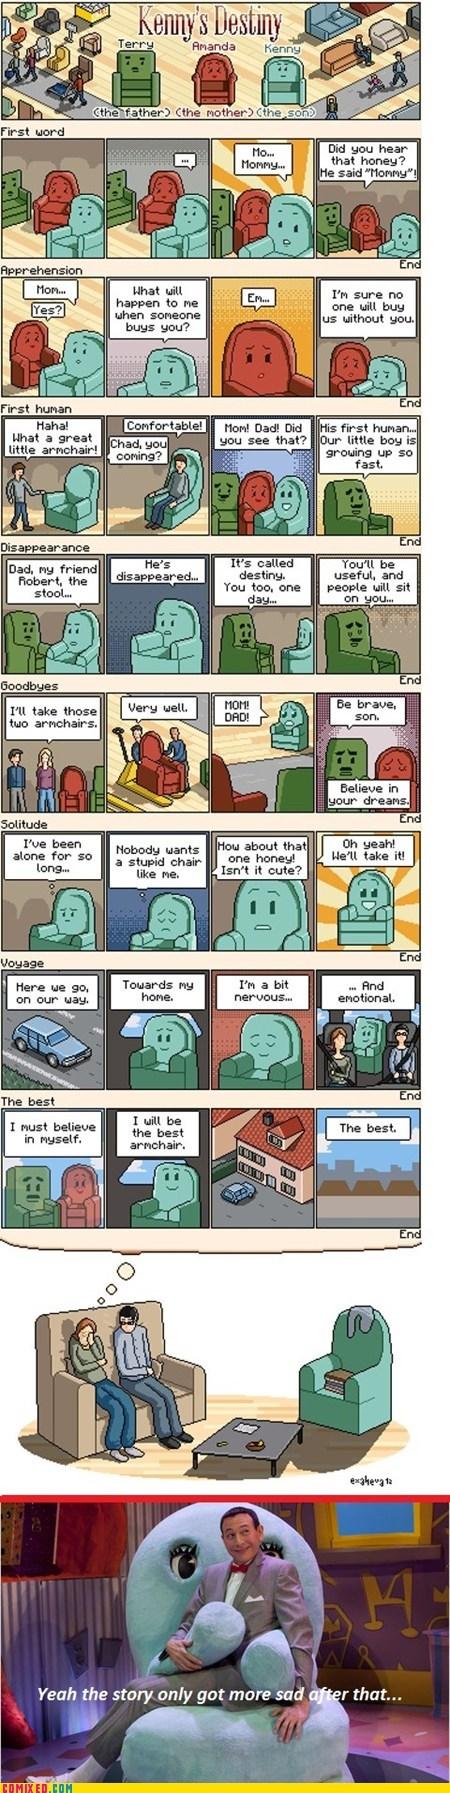 sad story,chairs,Reframe,furniture,feels